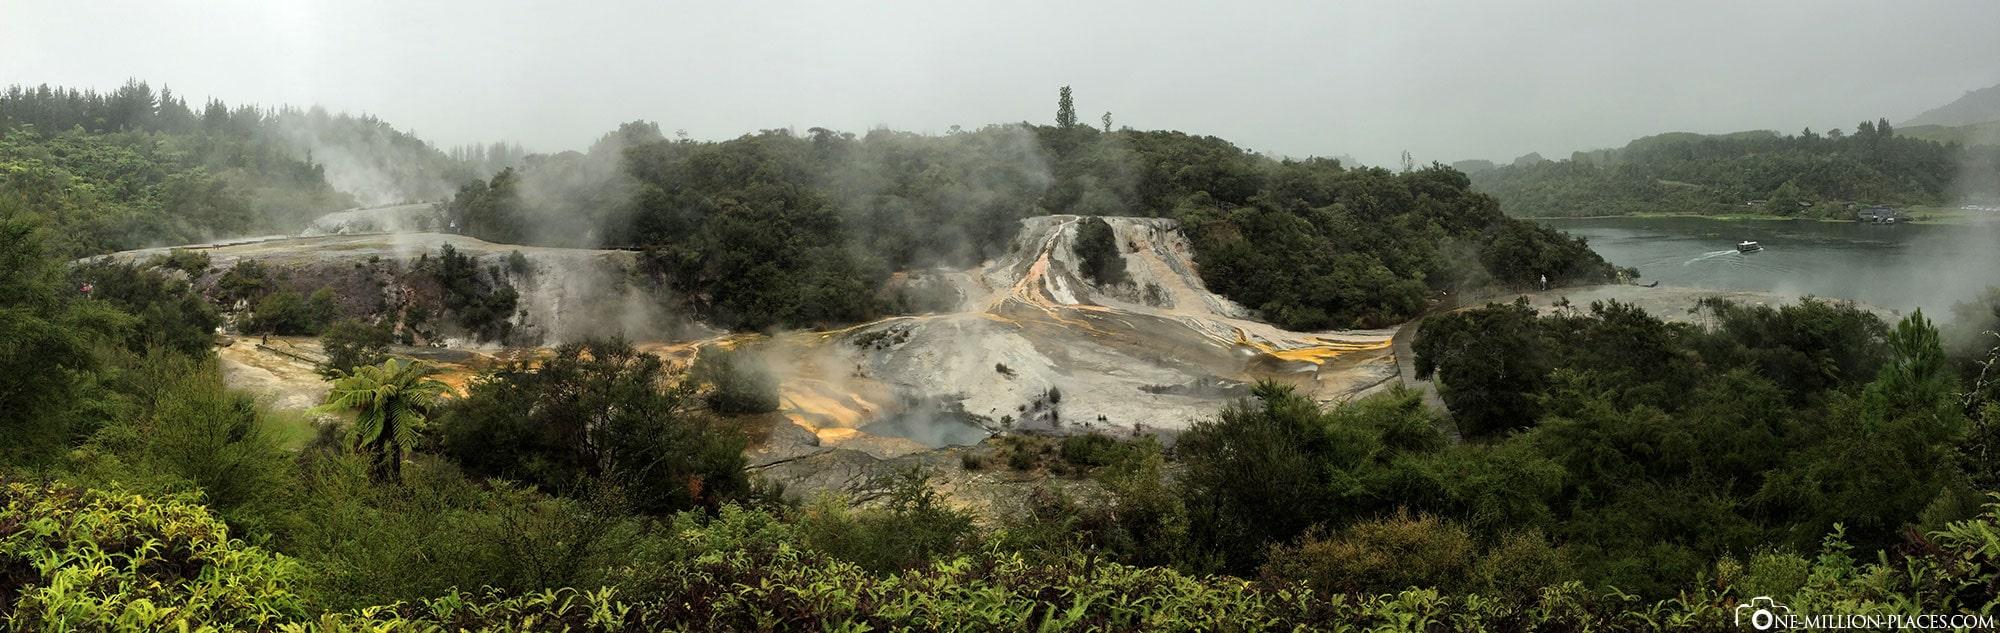 Panorama, Orakei Korako, New Zealand, Geothermal Region, On Your Own, Travelreport